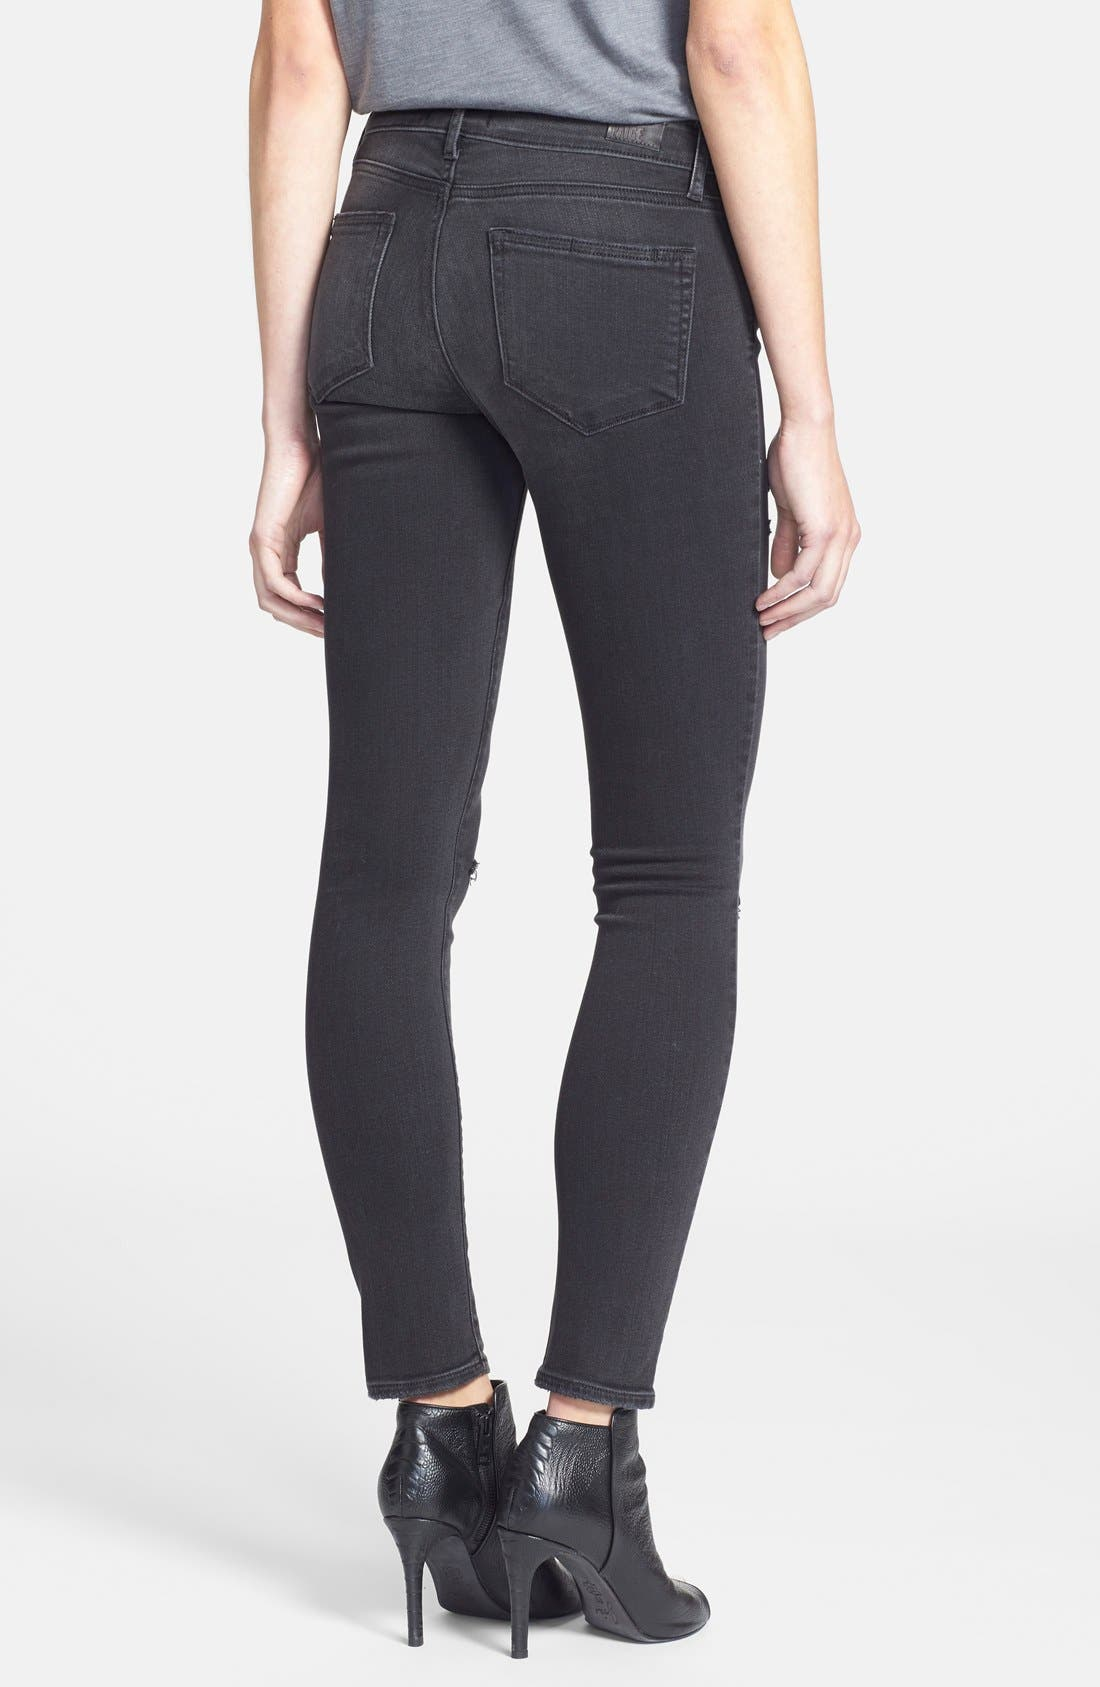 Alternate Image 2  - Paige Denim 'Verdugo' Ultra Skinny Jeans (Rayed Destructed)